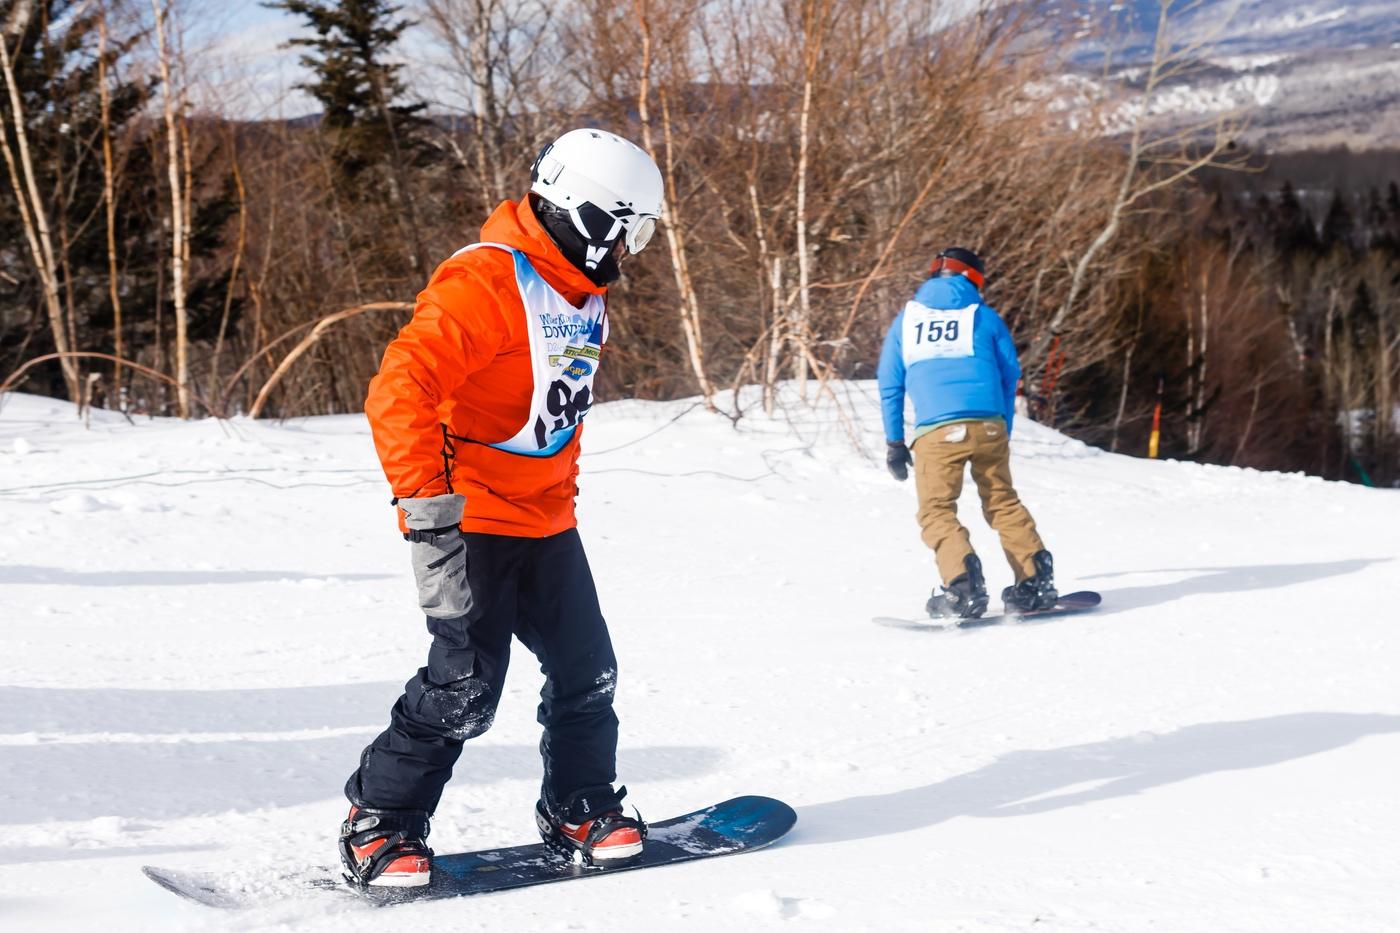 WinterKids Downhill 24 2021 SDP 3357